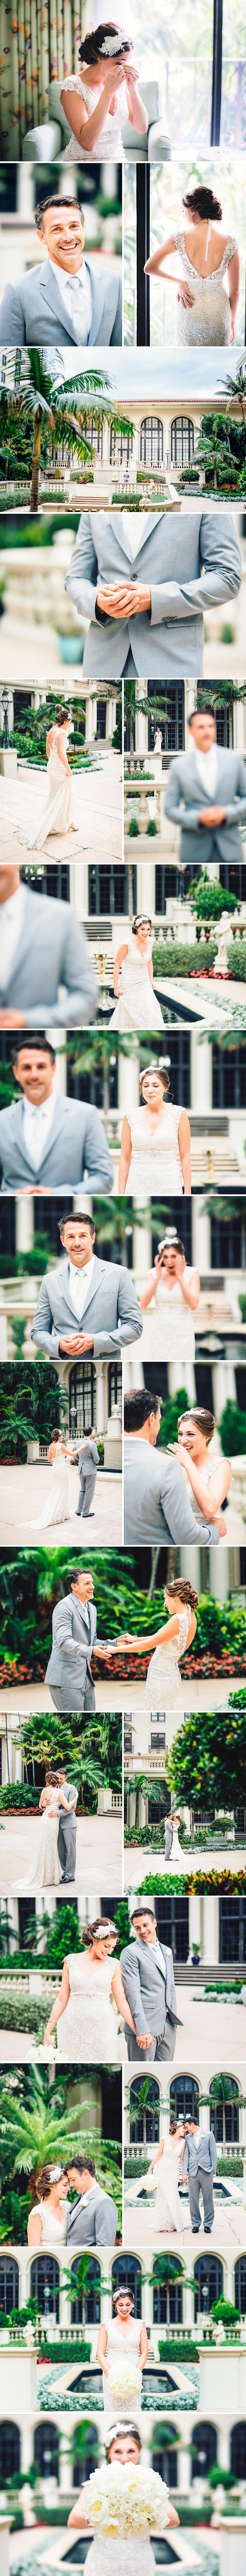 Chicago_Fine_Art_Wedding_Photography_macklin5.jpg